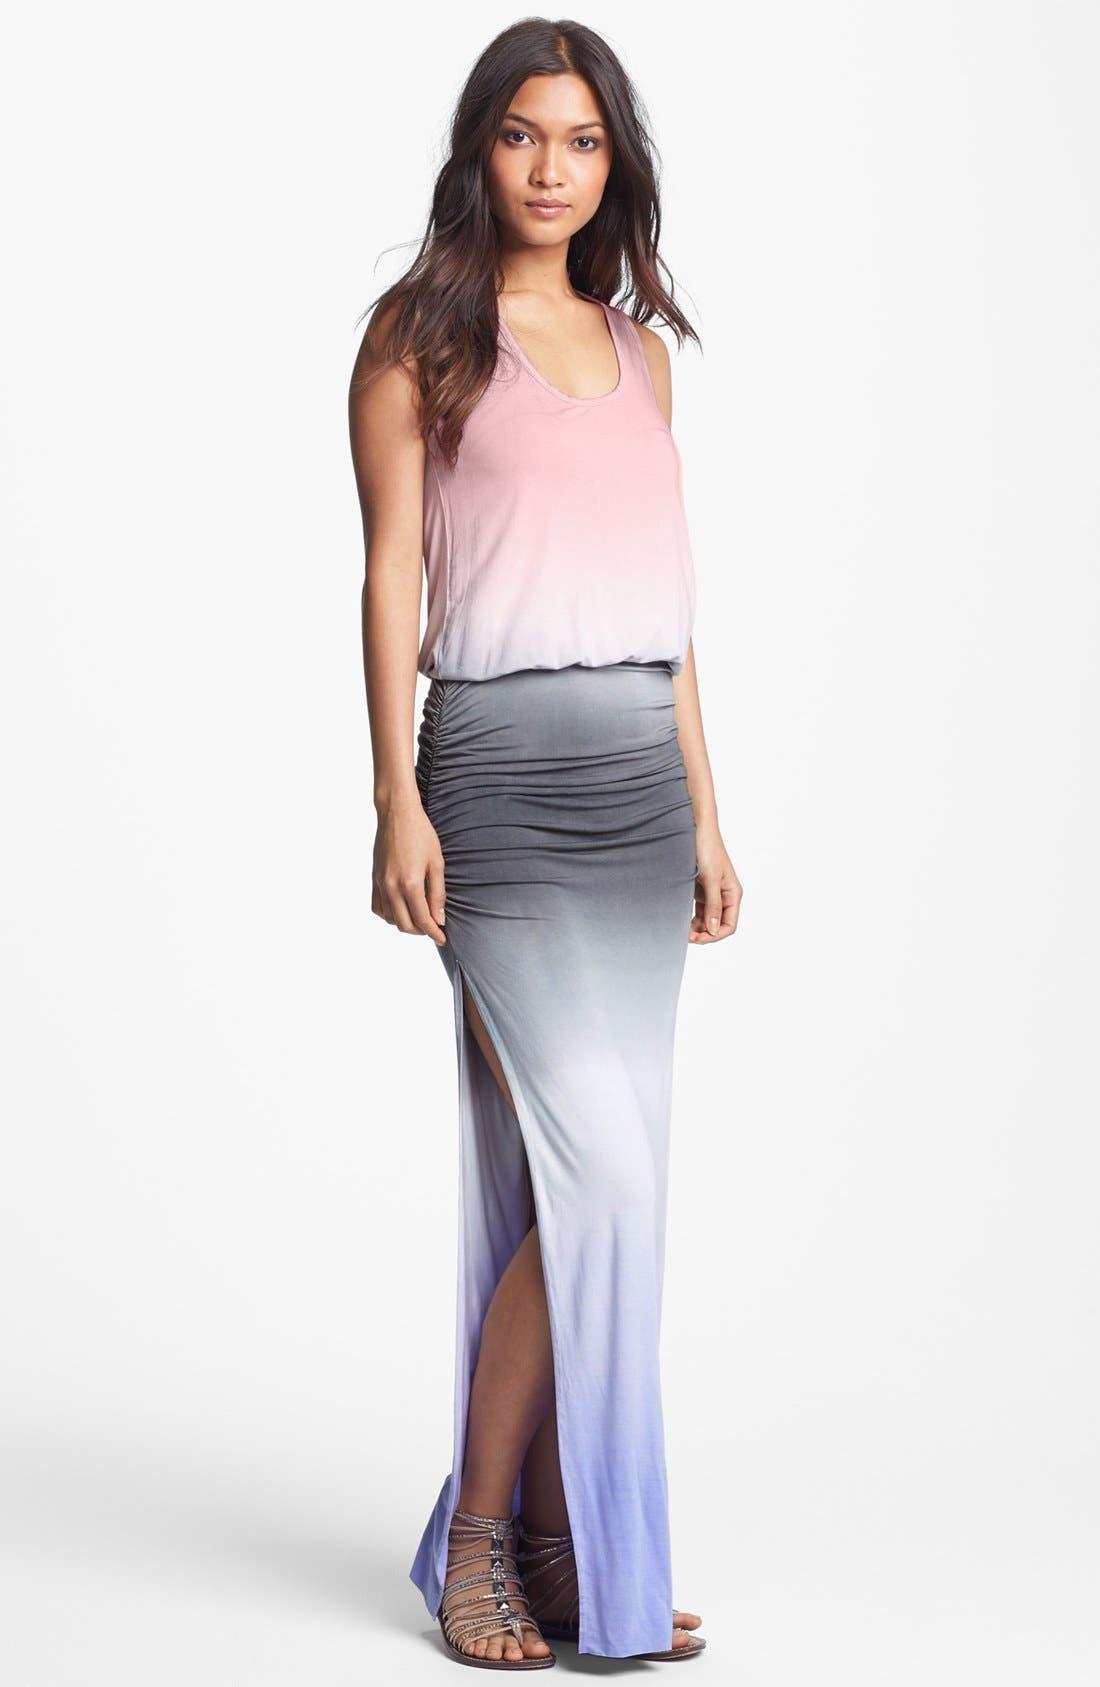 Main Image - Young, Fabulous & Broke 'Mel' Maxi Dress